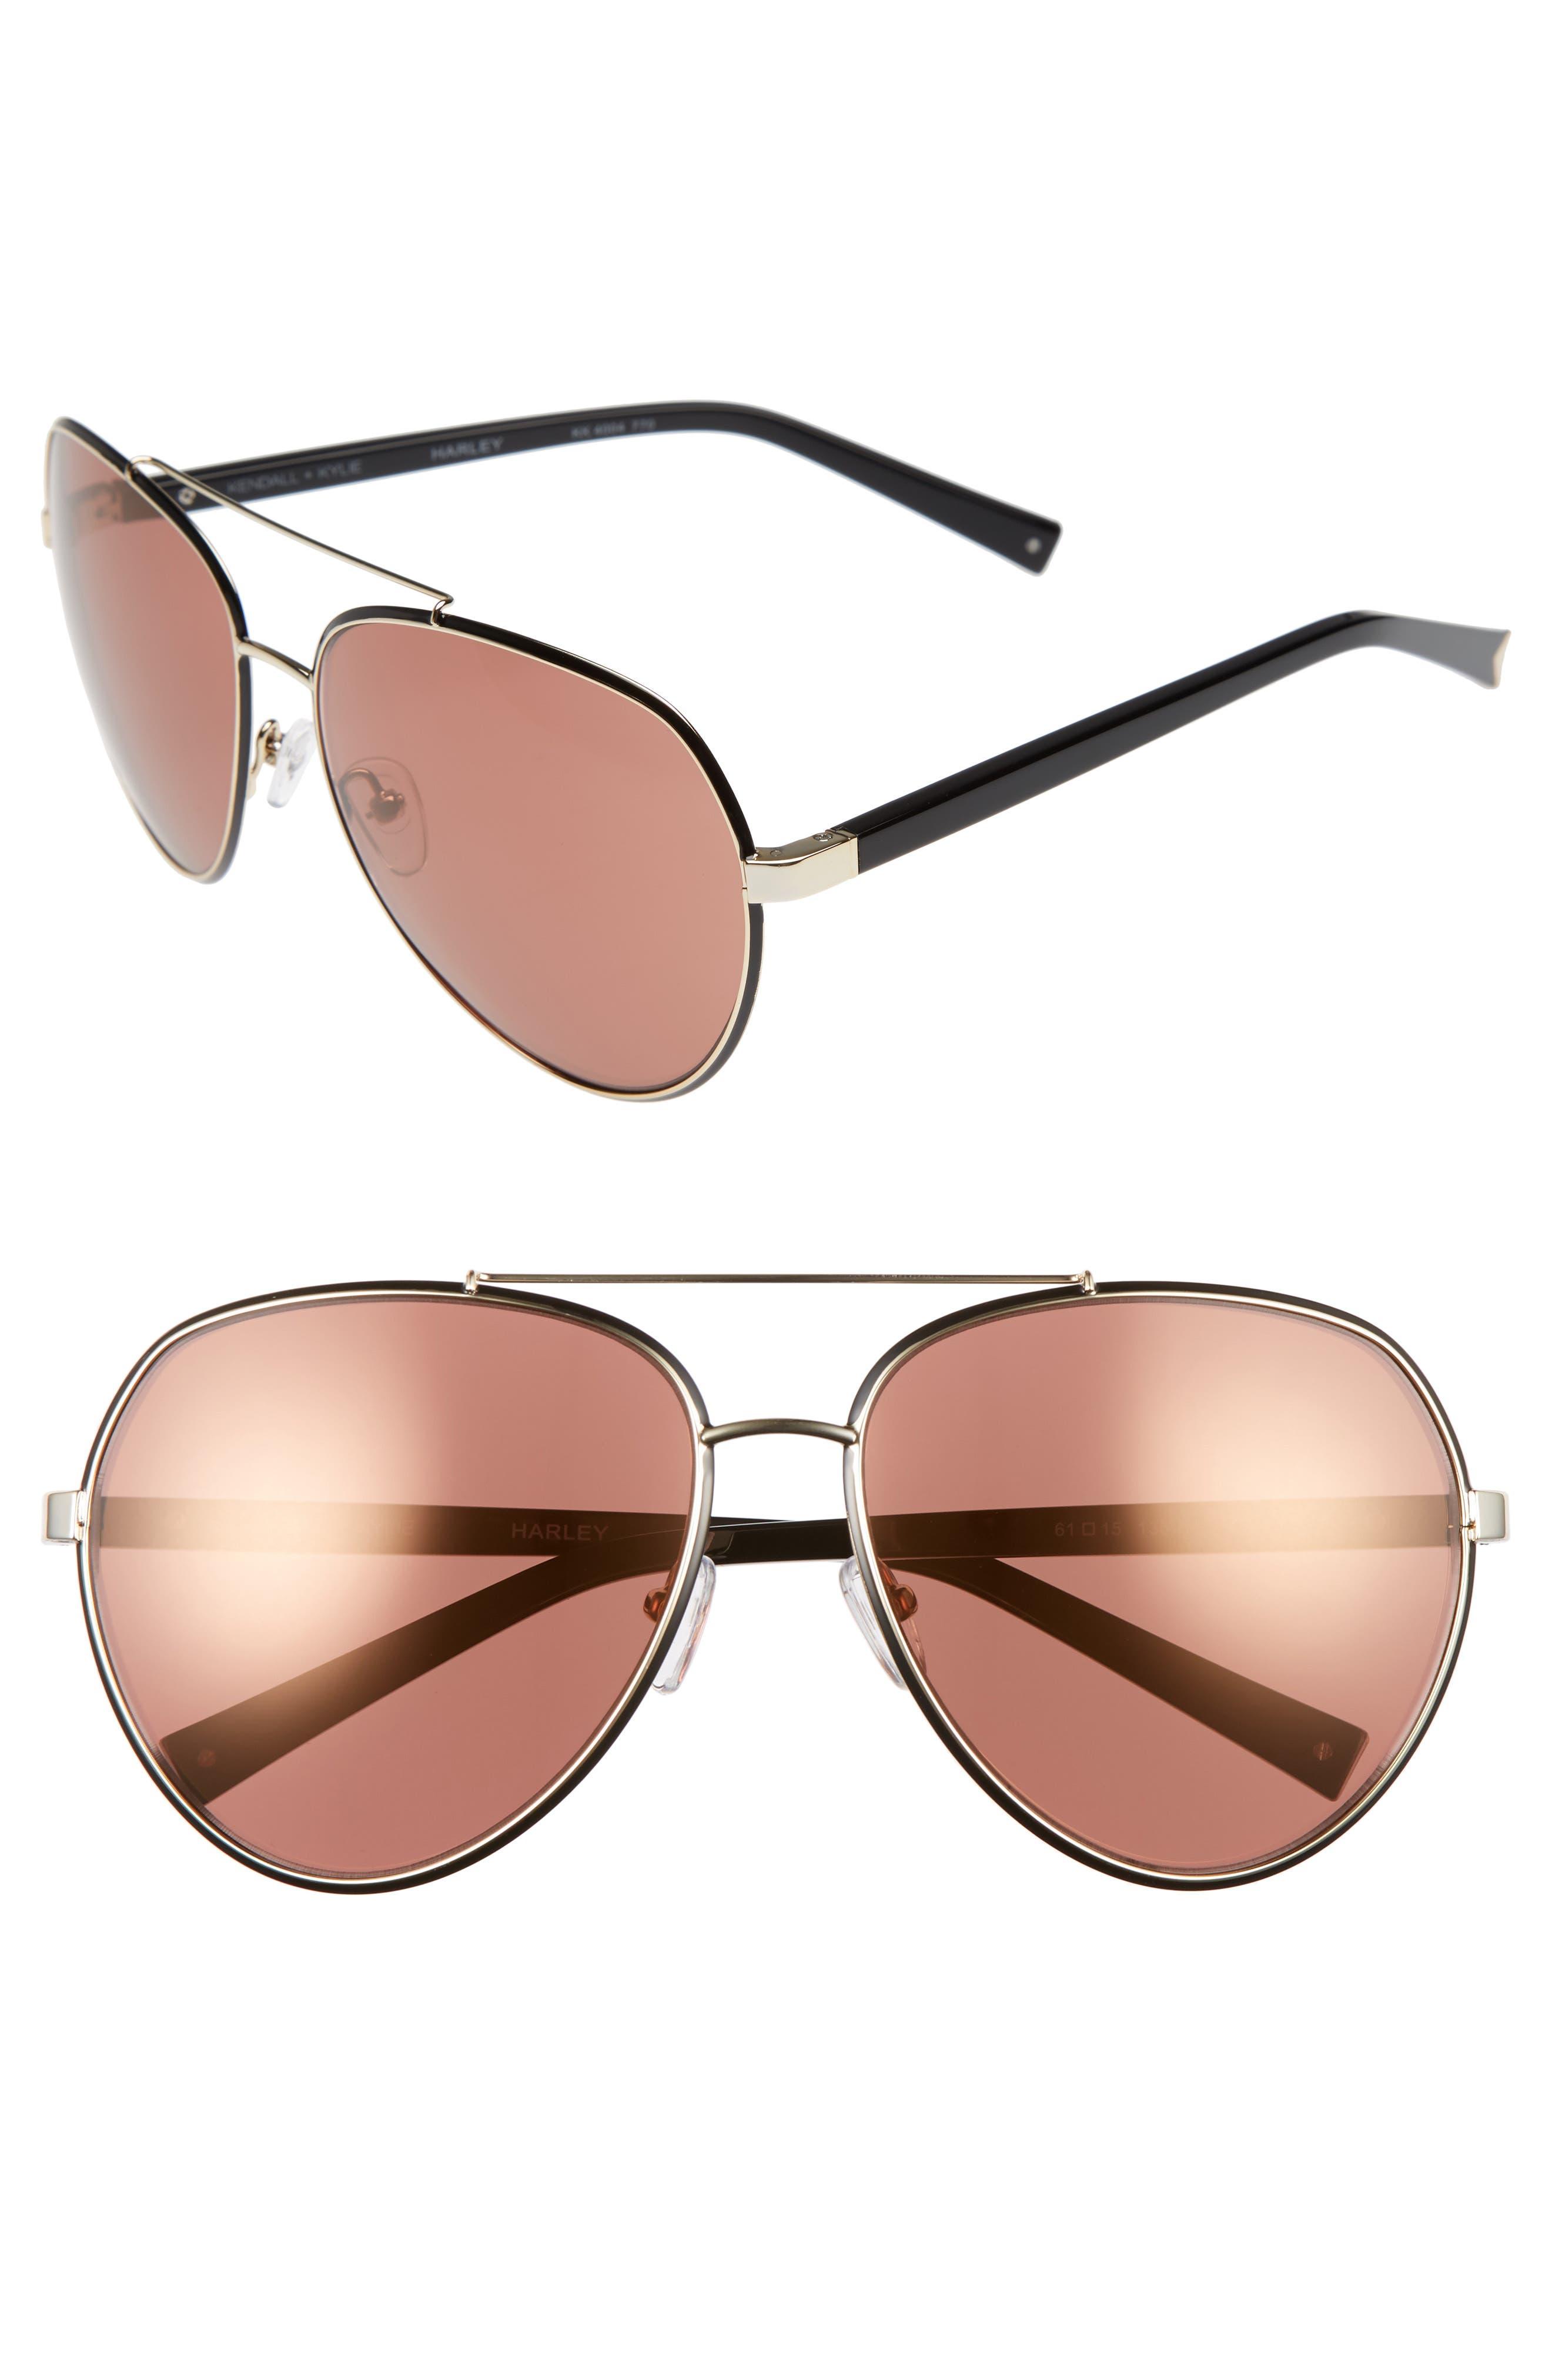 Alternate Image 1 Selected - KENDALL + KYLIE 61mm Aviator Sunglasses